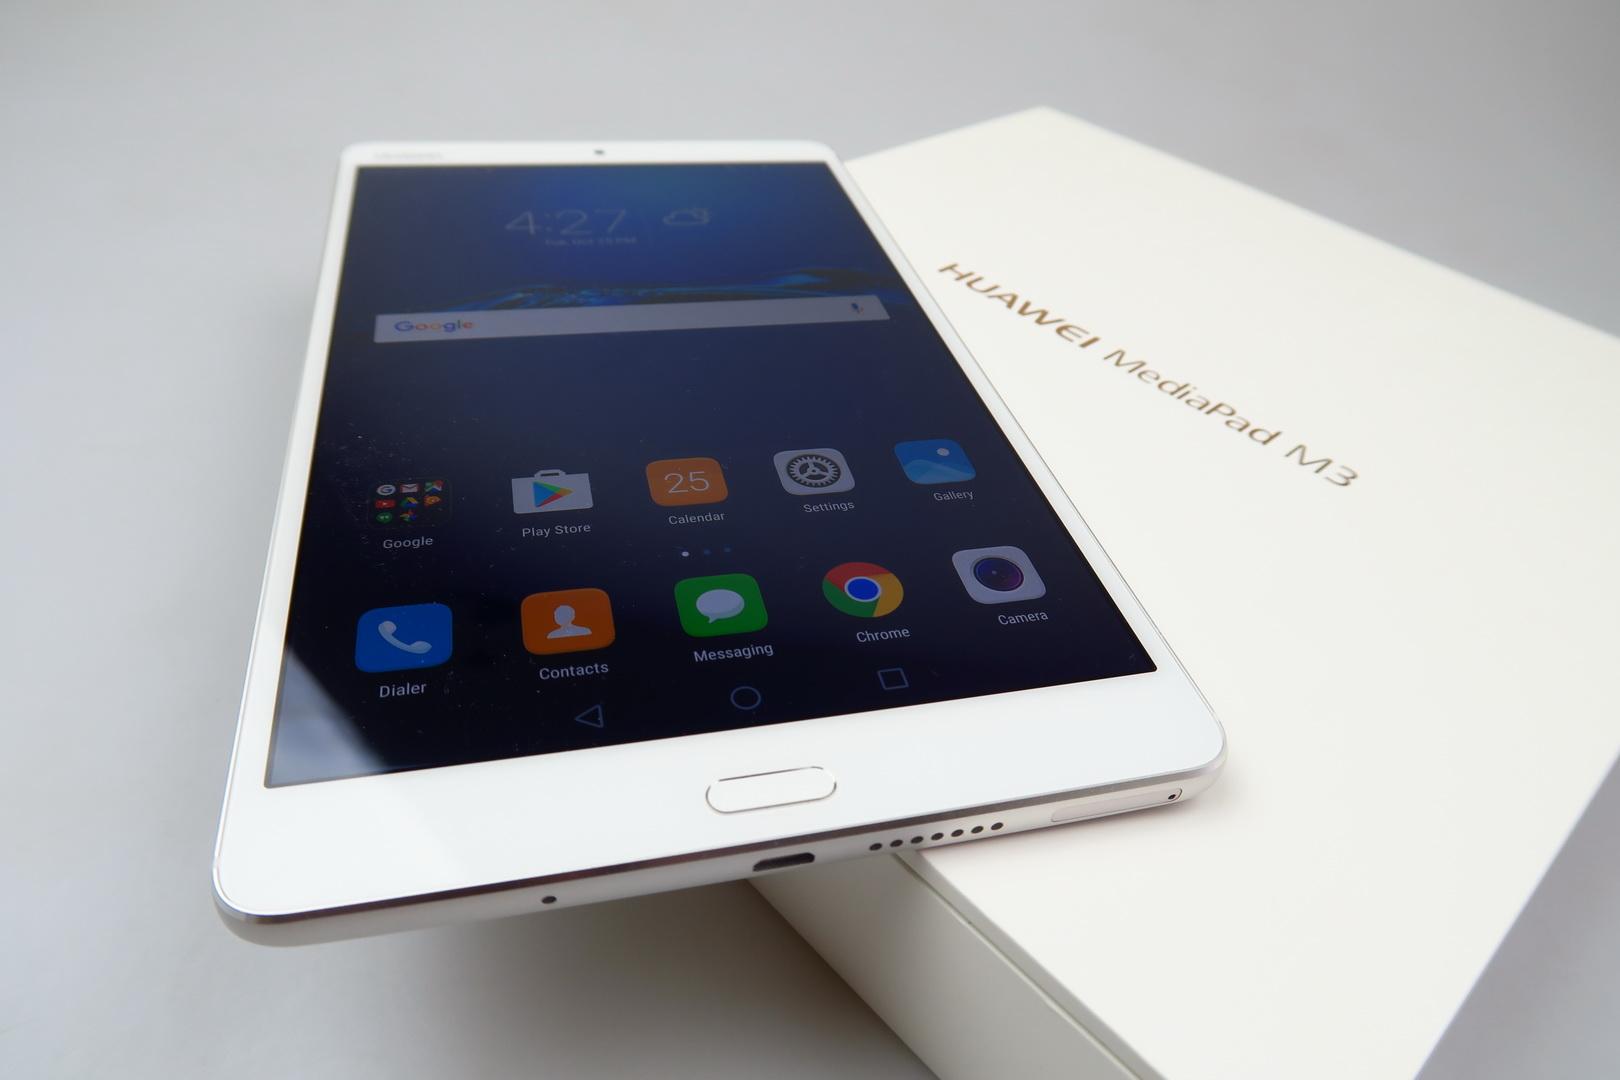 huawei tablet m3. huawei-mediapad-m3_021 huawei tablet m3